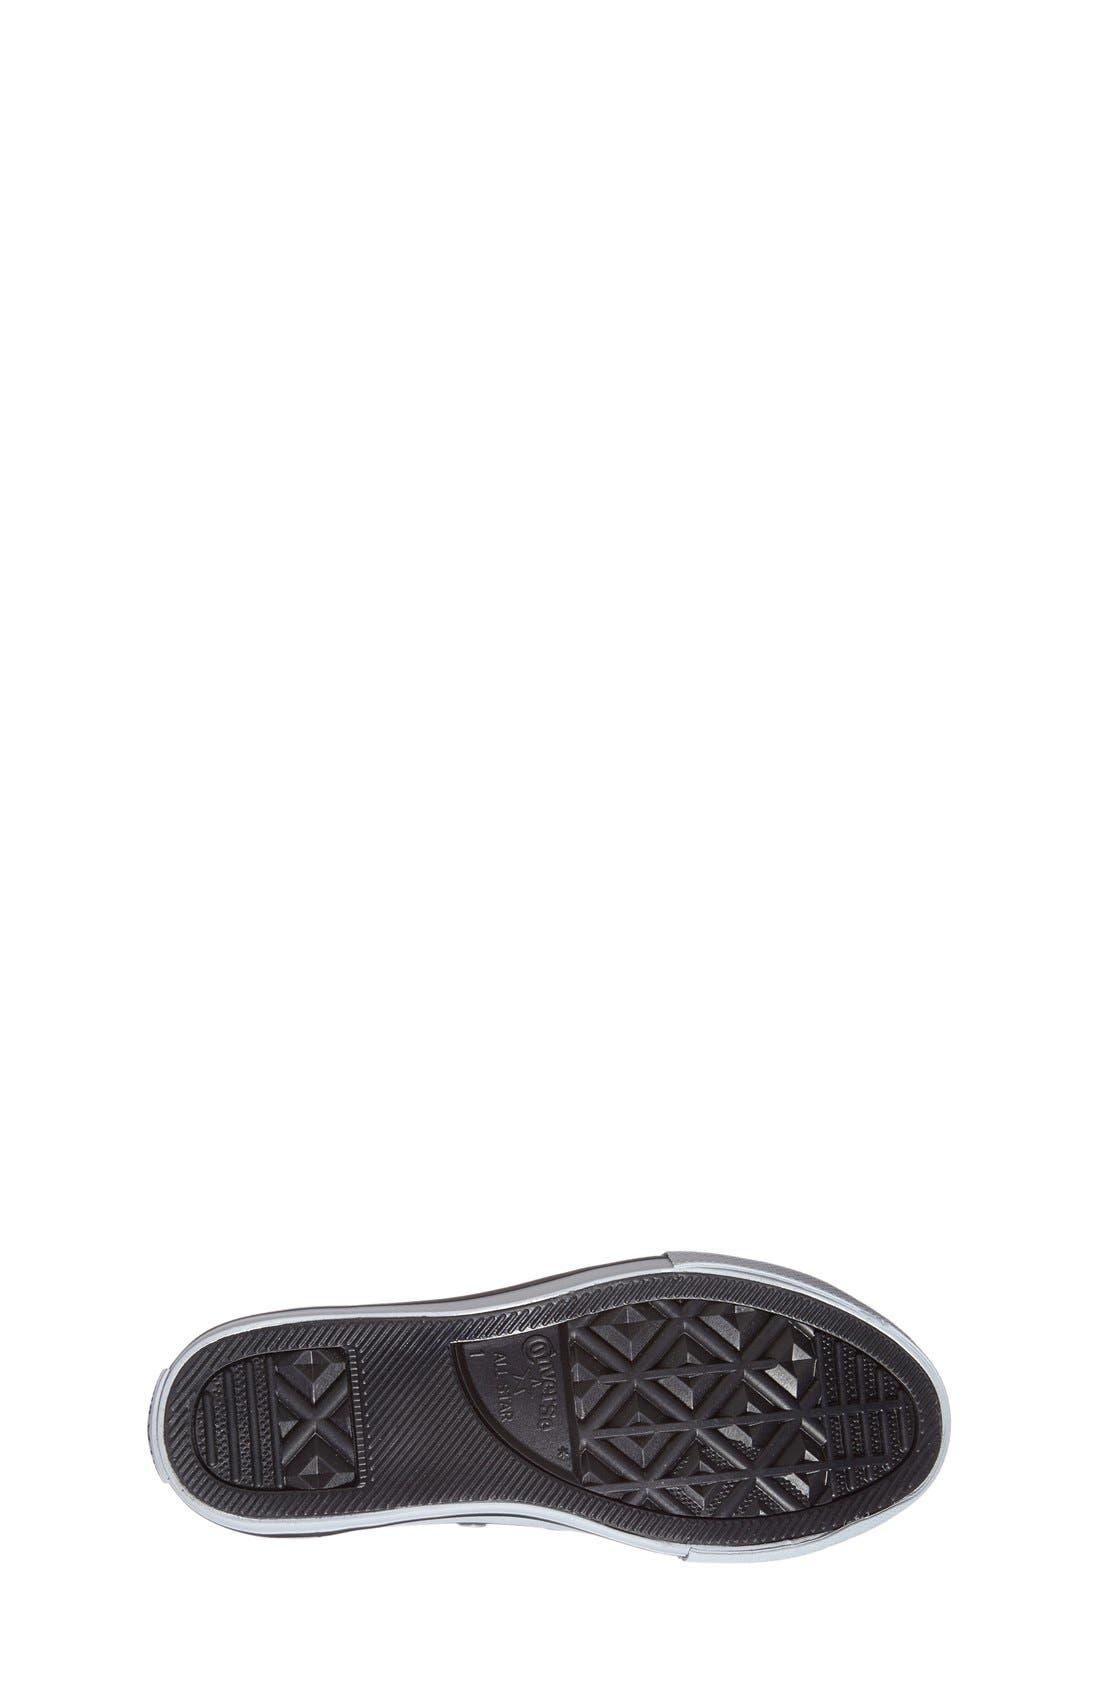 Alternate Image 4  - Converse Chuck Taylor® All Star® 'Ox' Sneaker (Toddler, Little Kid & Big Kid)